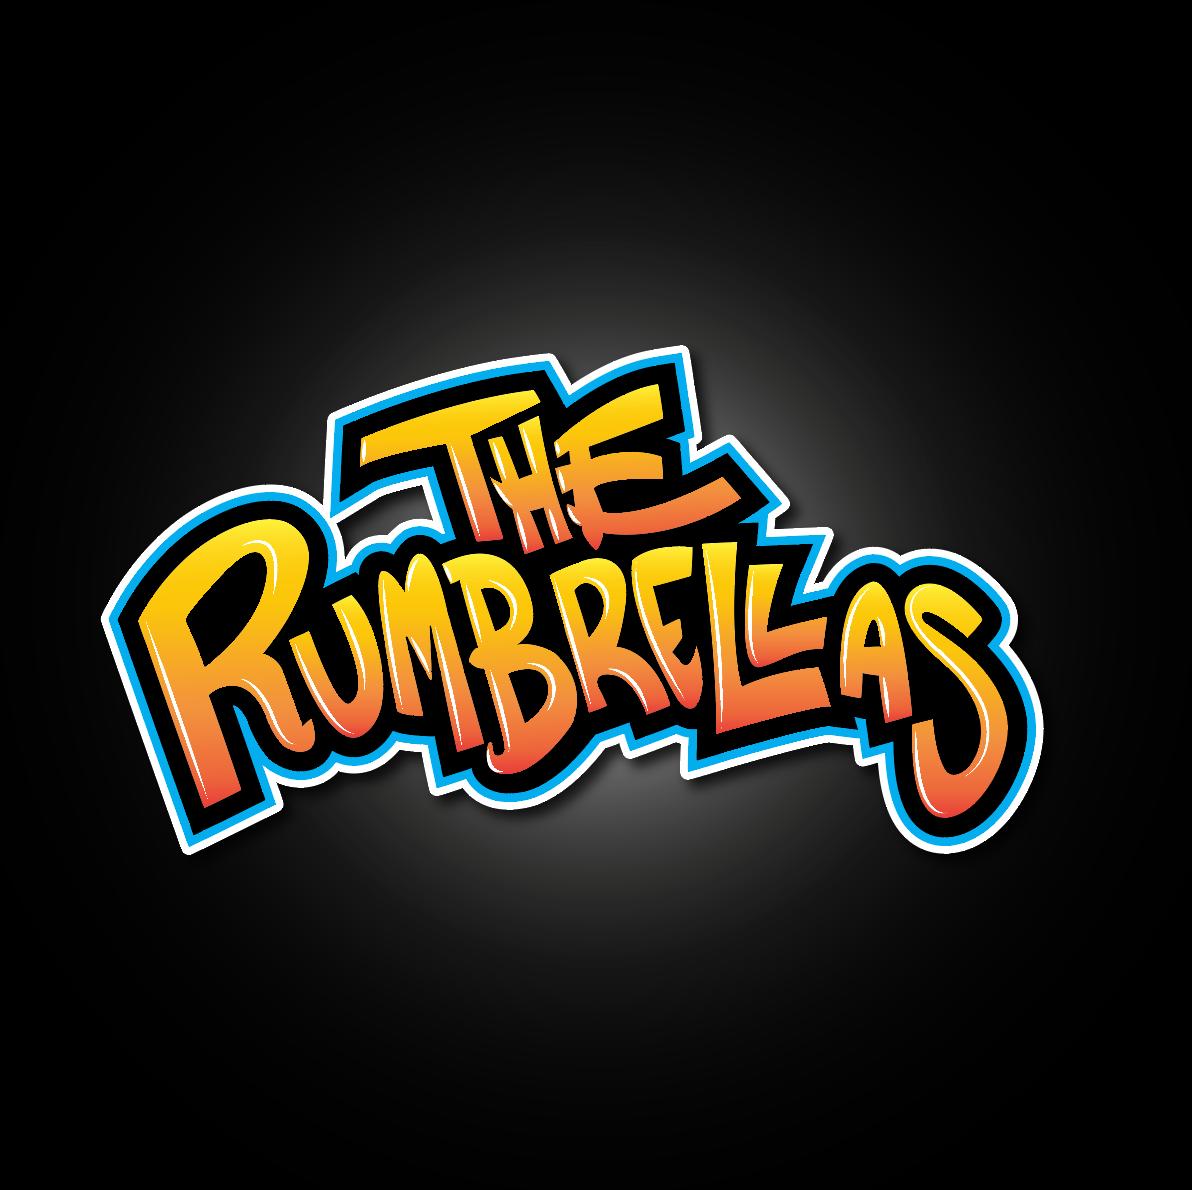 THE RUMBRELLAS